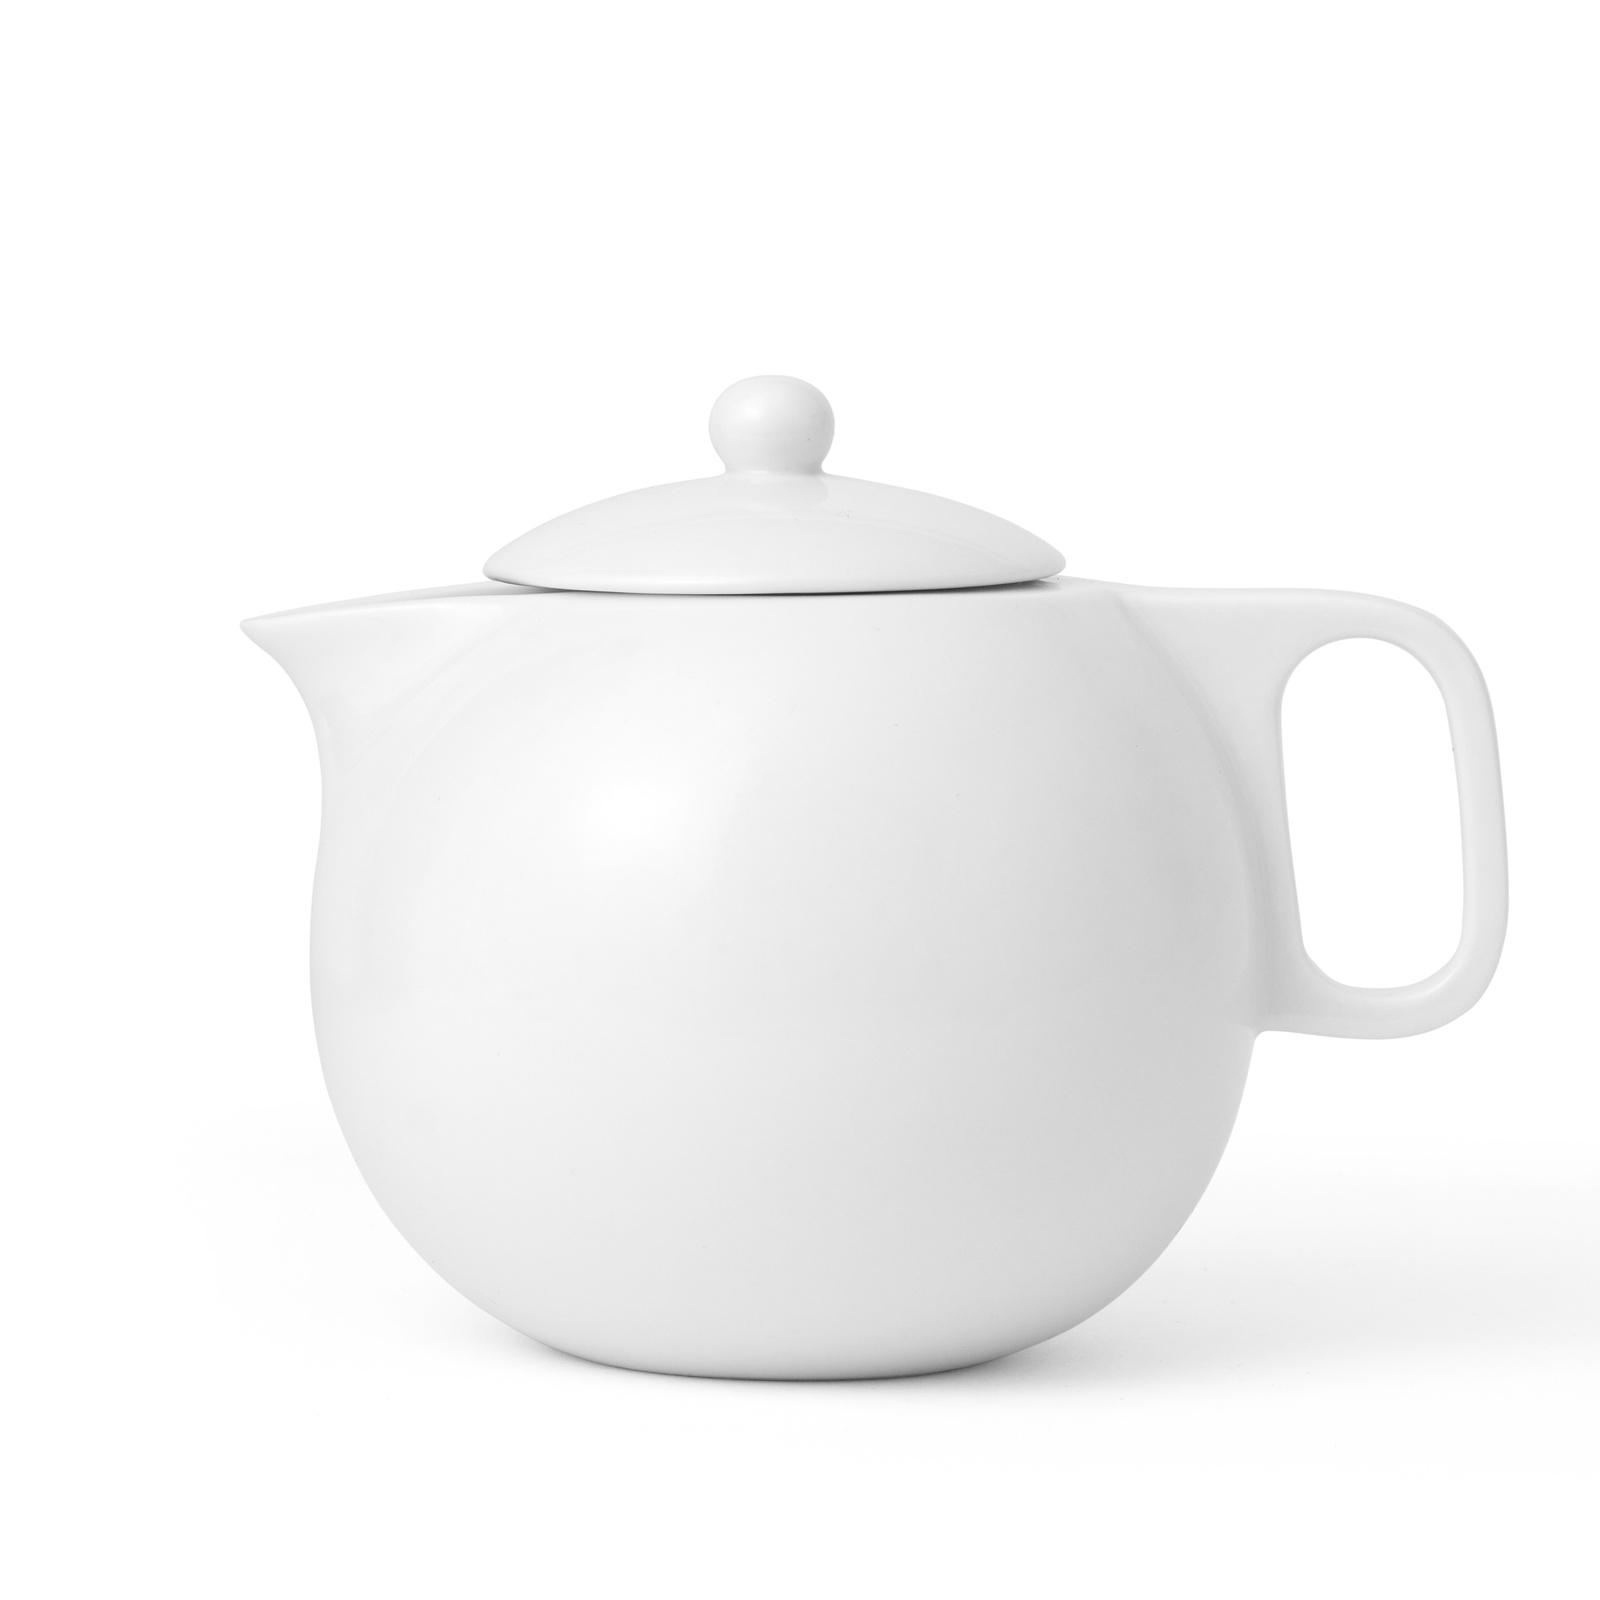 Чайник заварочный Viva scandinavia Jaimi с ситечком, V76002, 900 мл